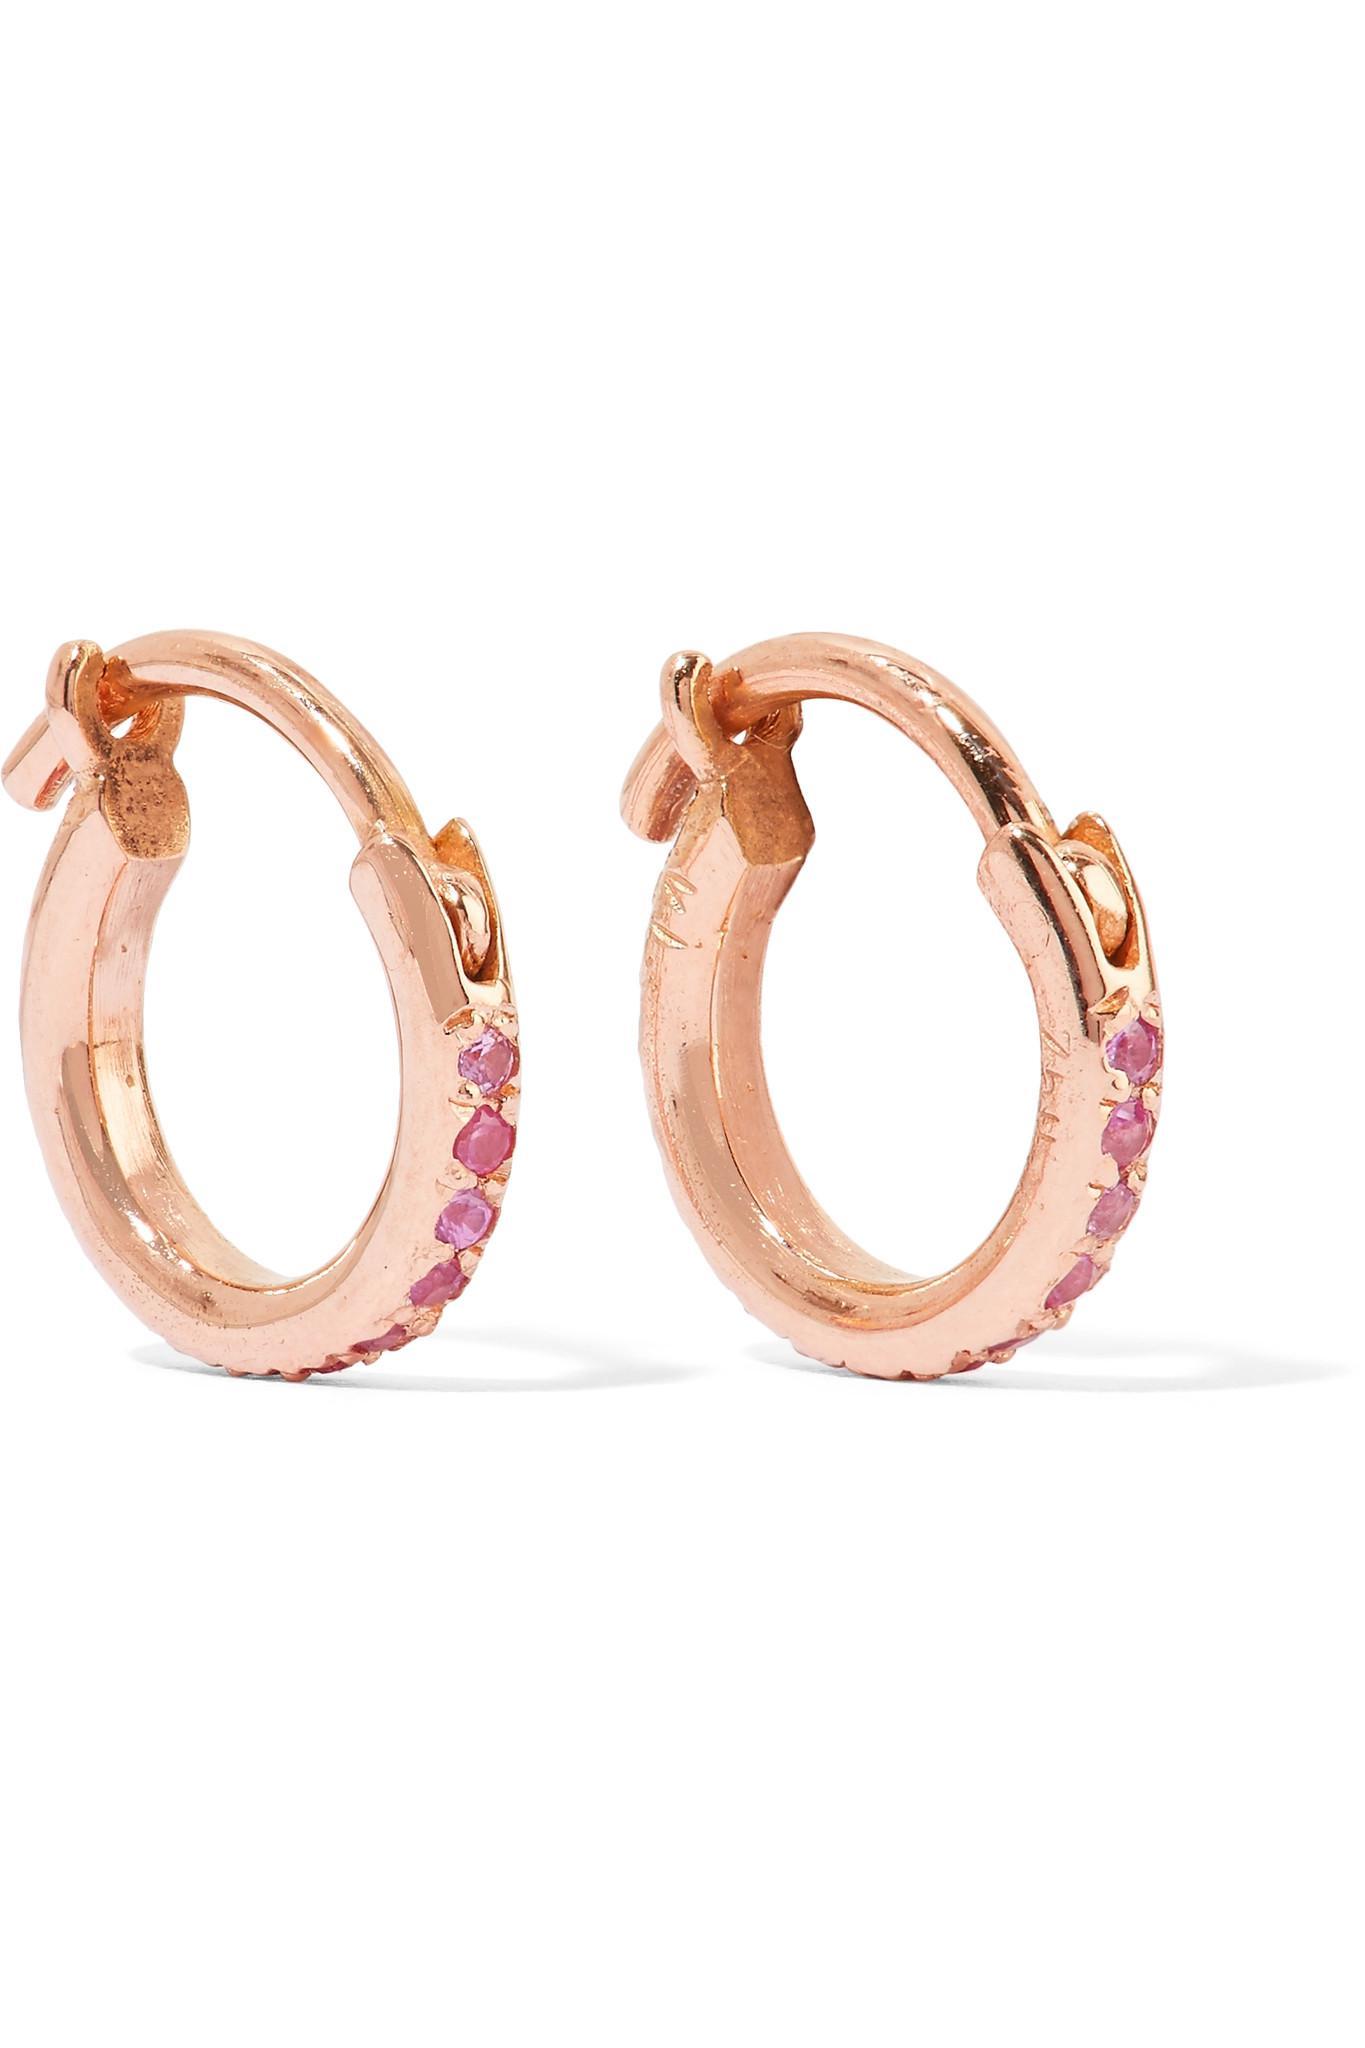 mini rose gold and sapphire hoops Ileana Makri FeaG0O